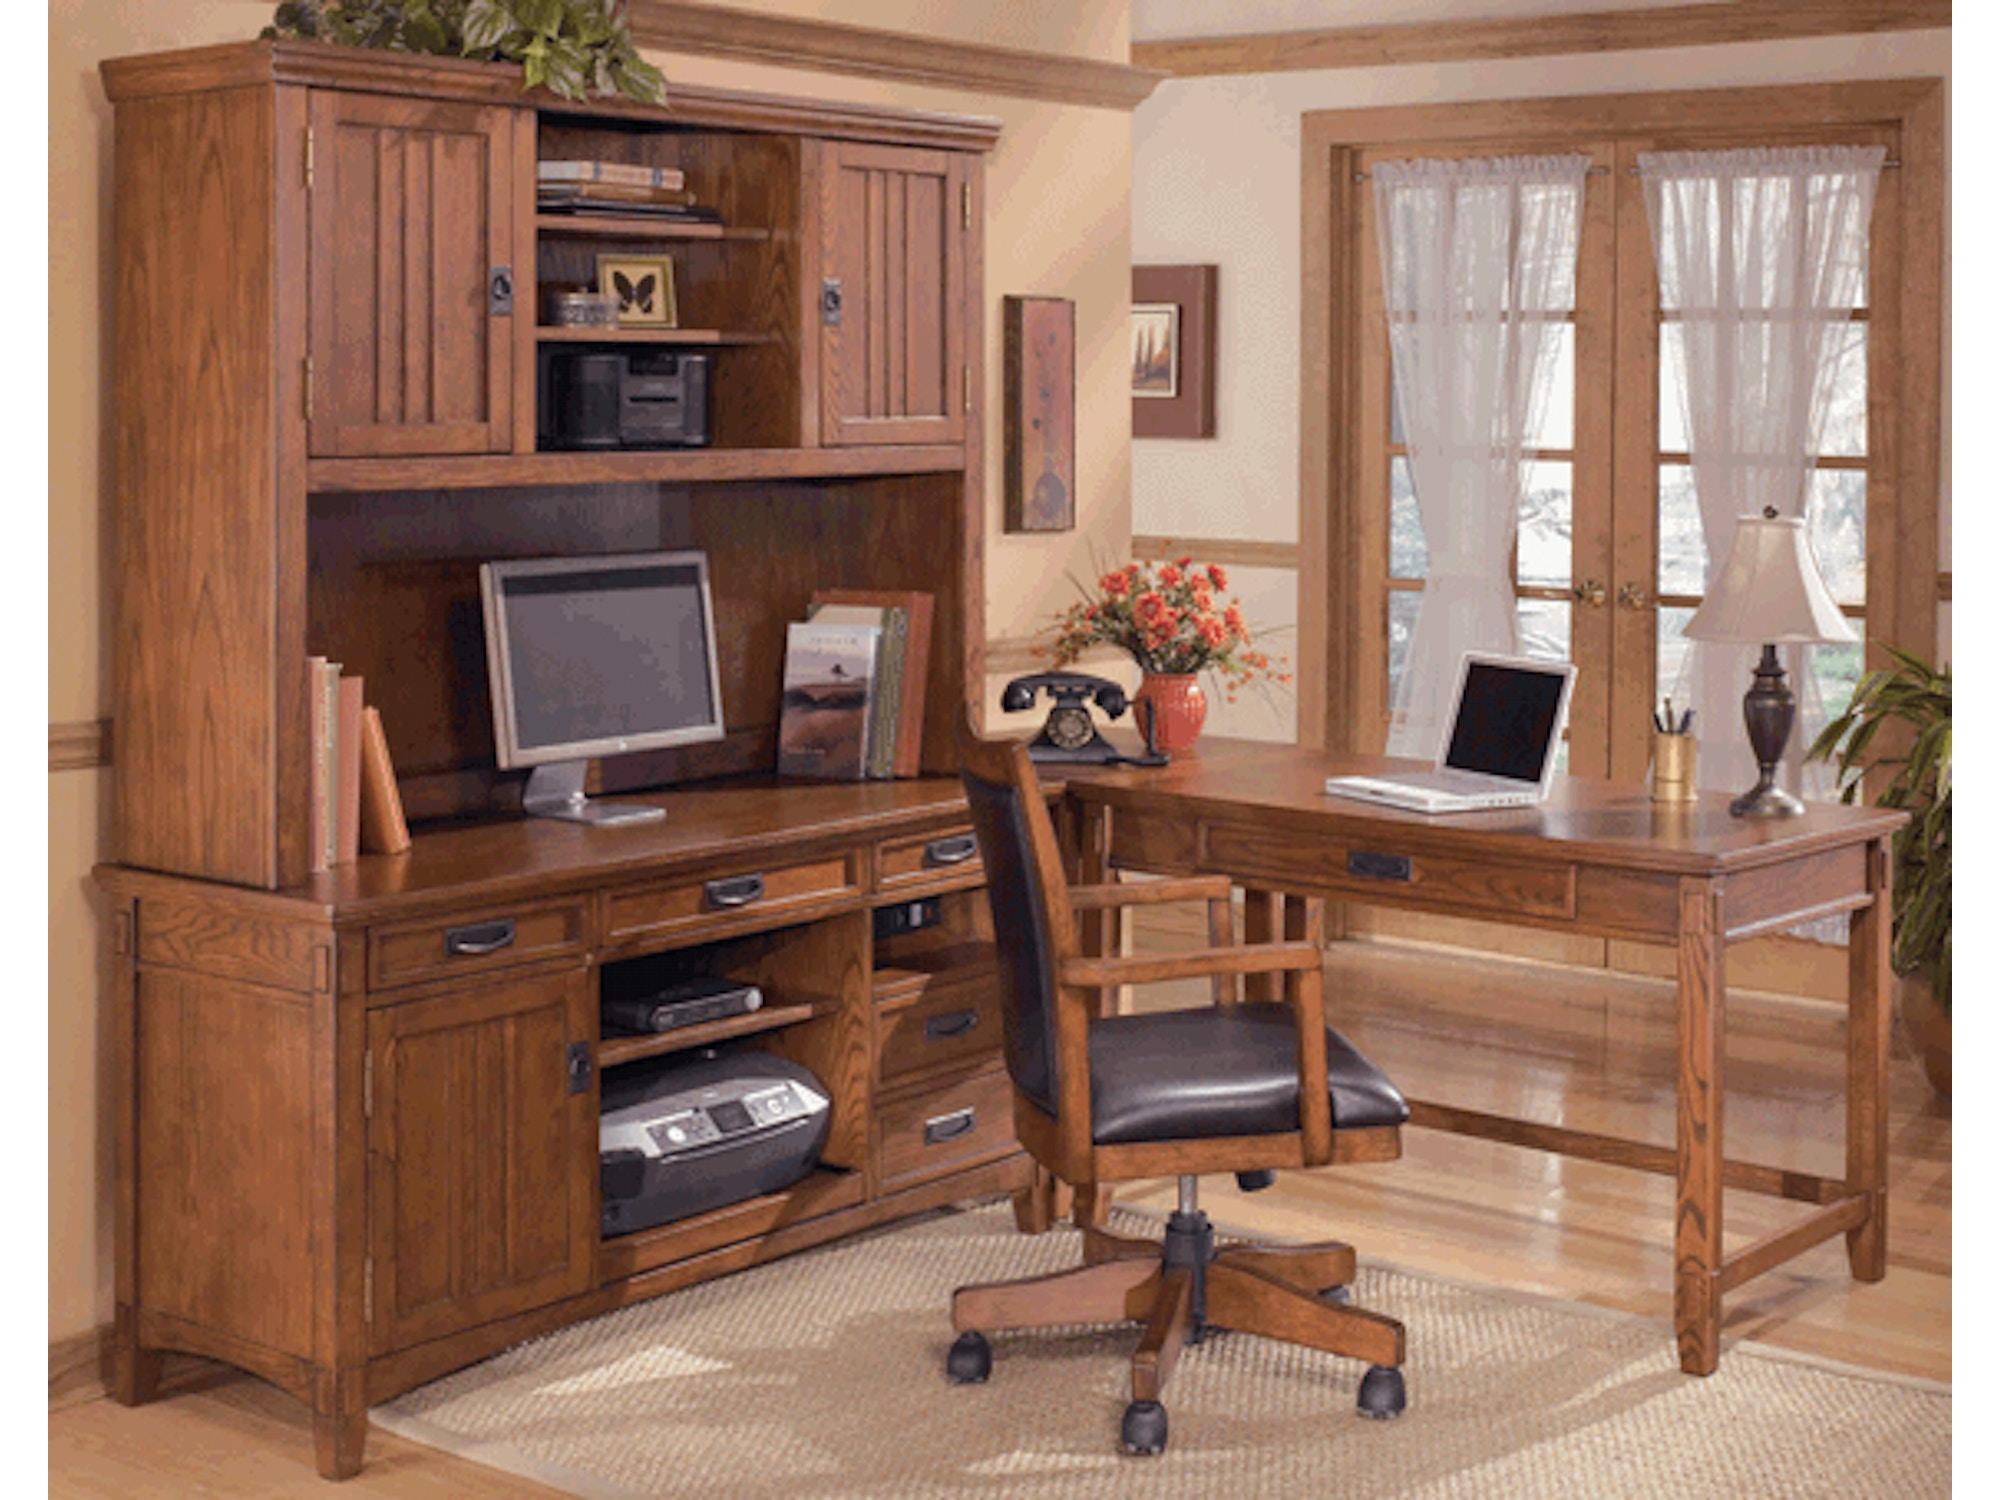 Home Office Furniture Cincinnati home office furniture cincinnati prodigious amazing chairs 19 911866 Cross Island Home Office